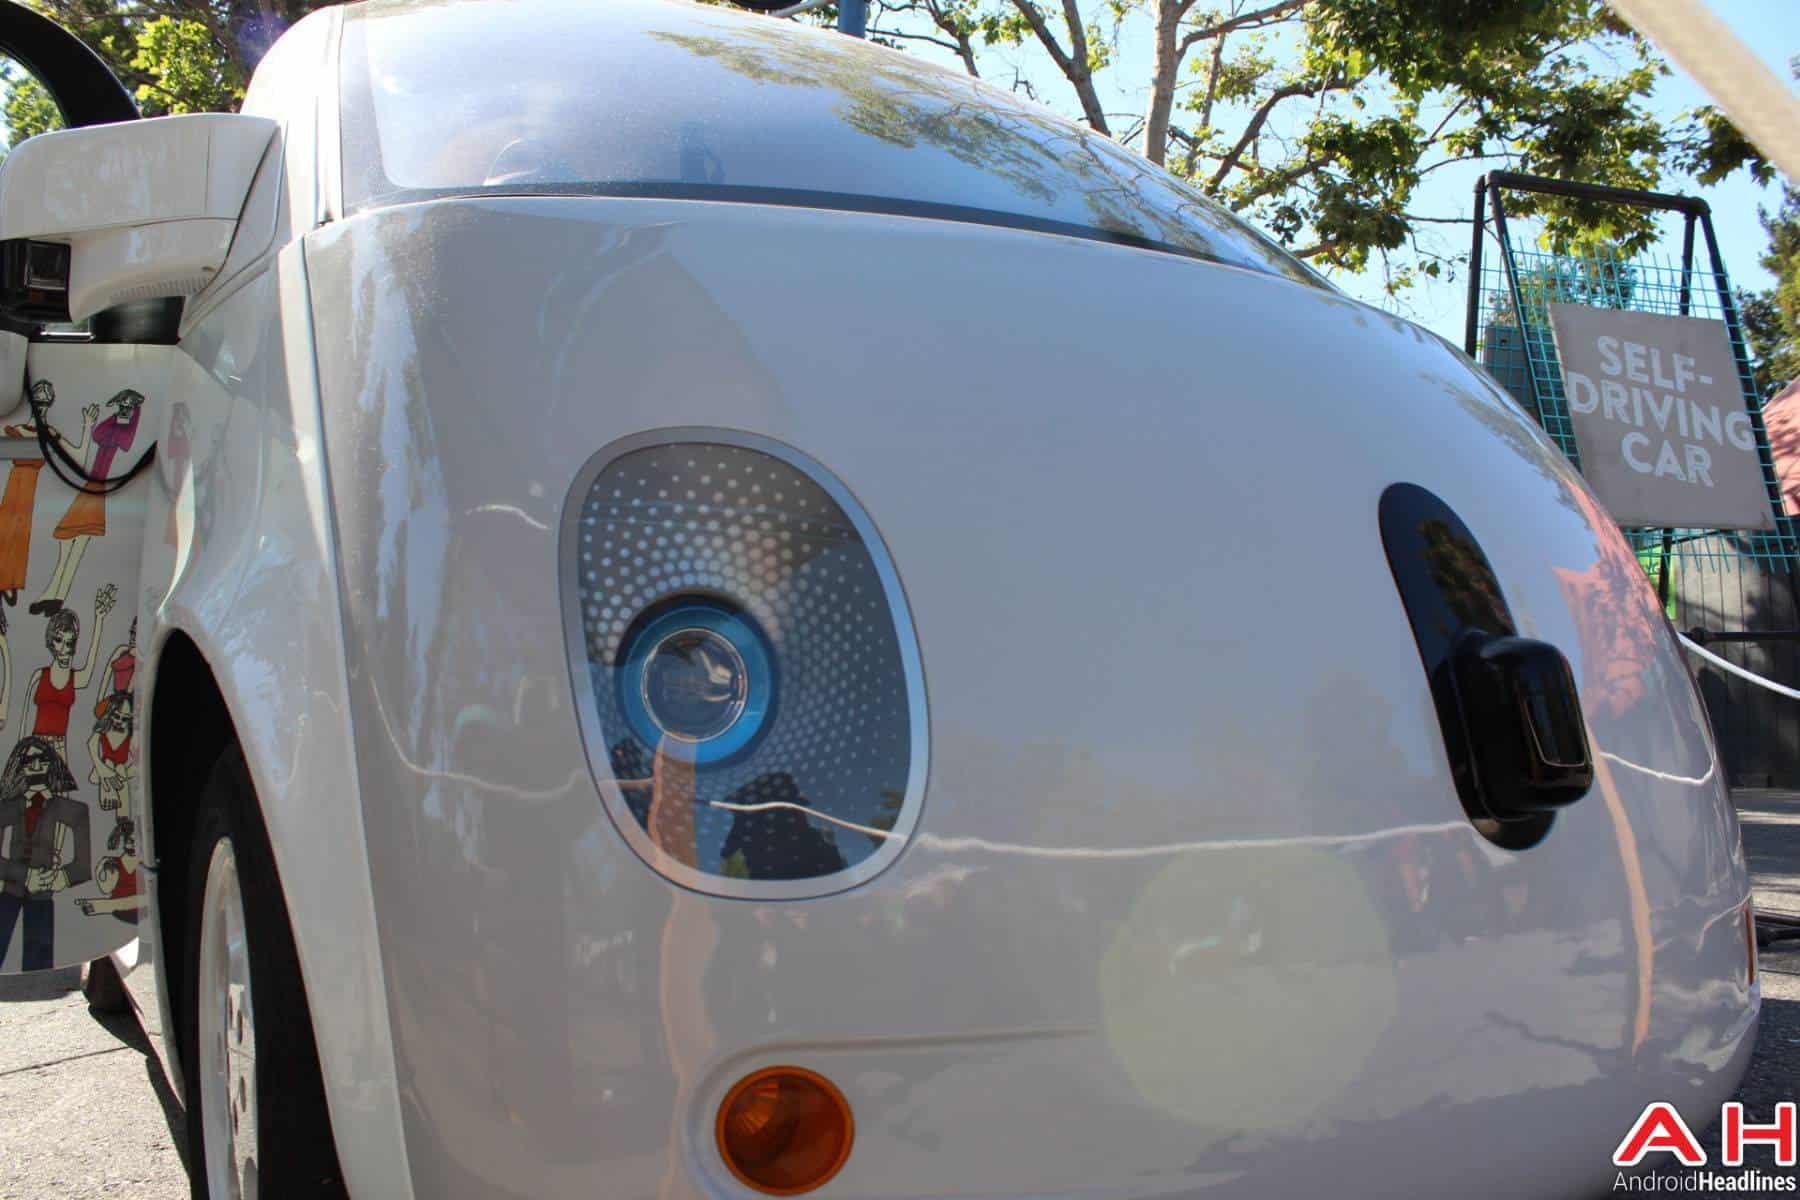 Google Self Driving Car IO AH 13